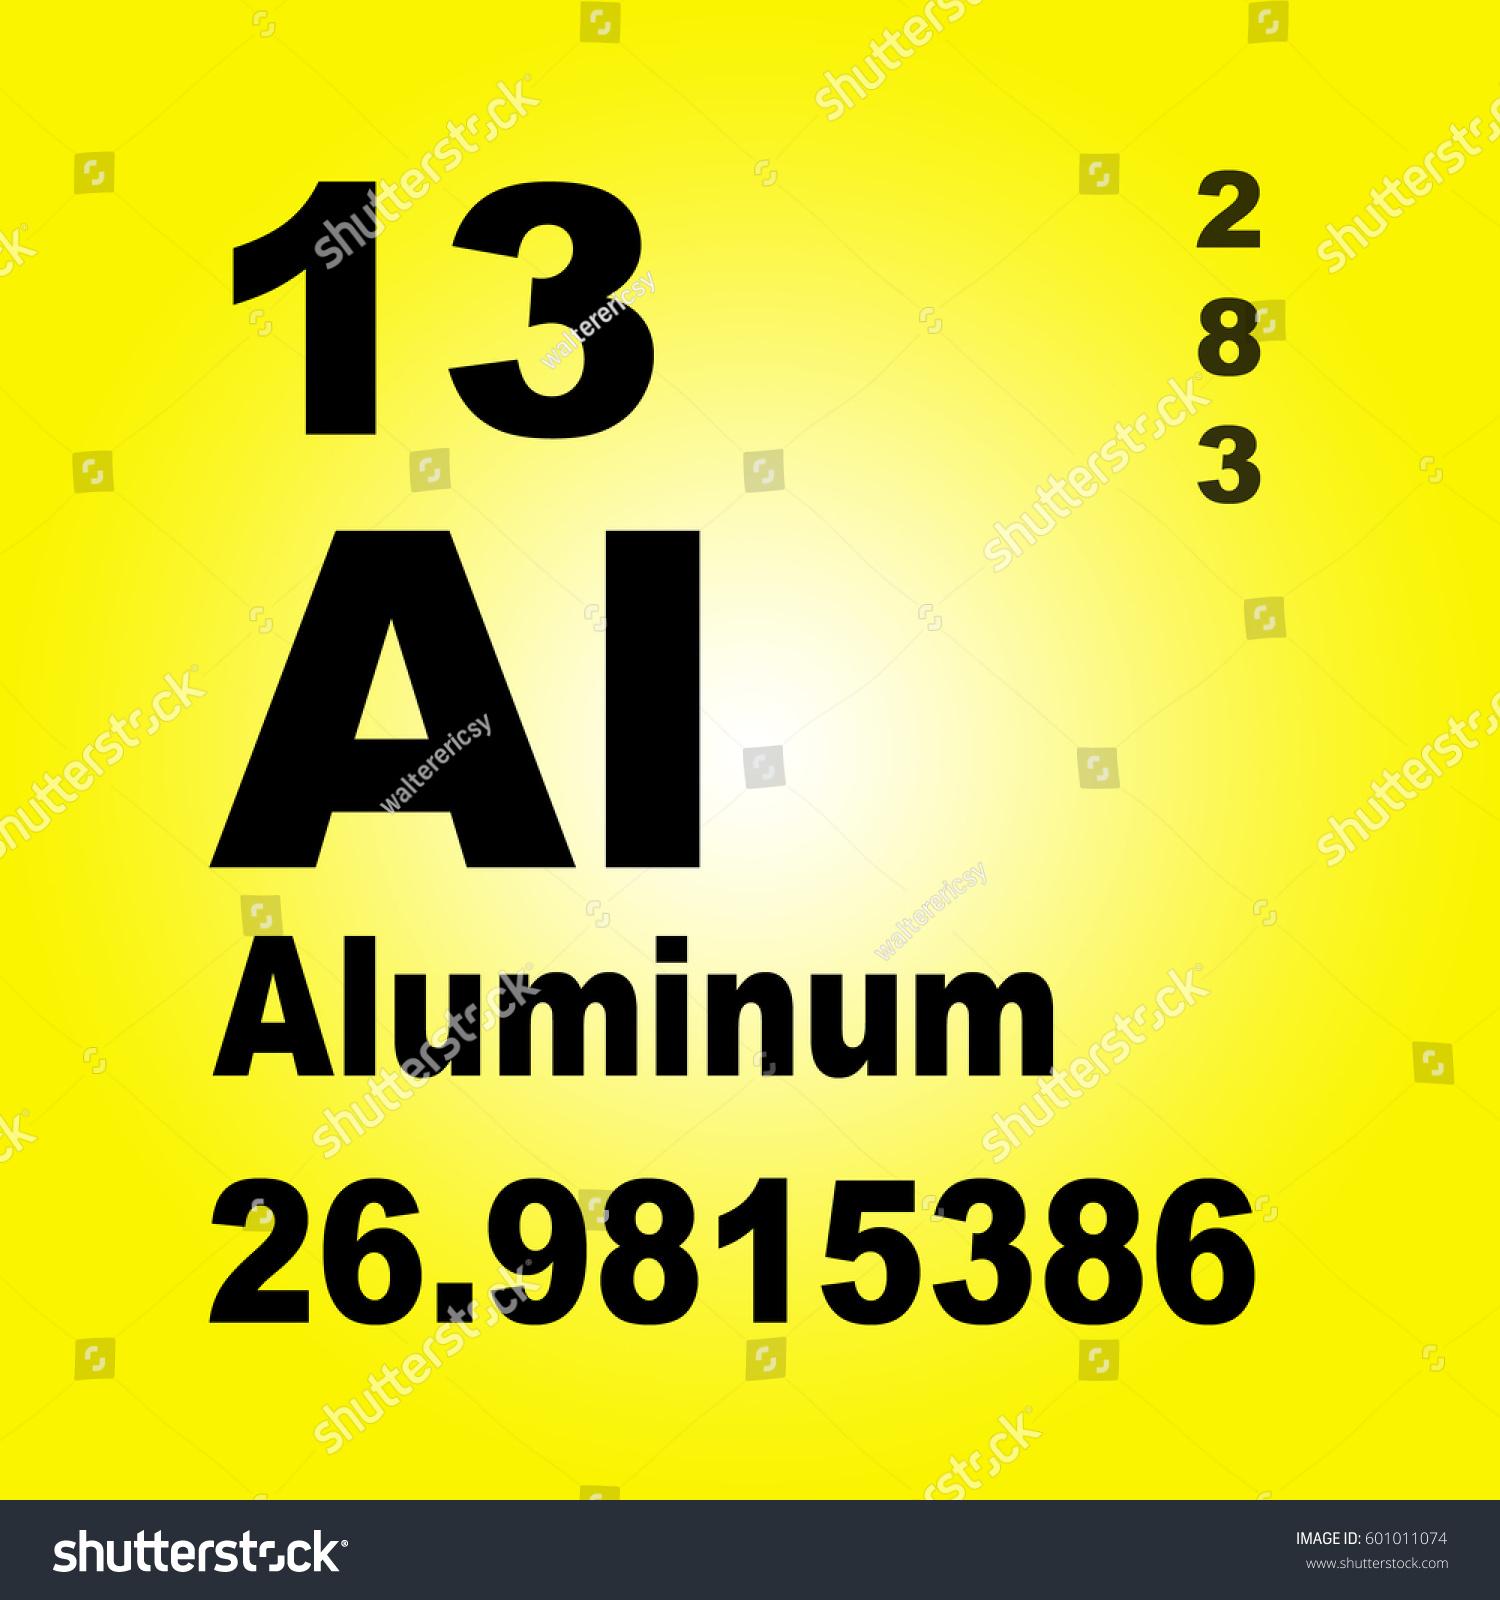 Aluminum symbol periodic table images periodic table images aluminum on periodic table image collections periodic table images periodic table symbol for aluminum image collections gamestrikefo Image collections